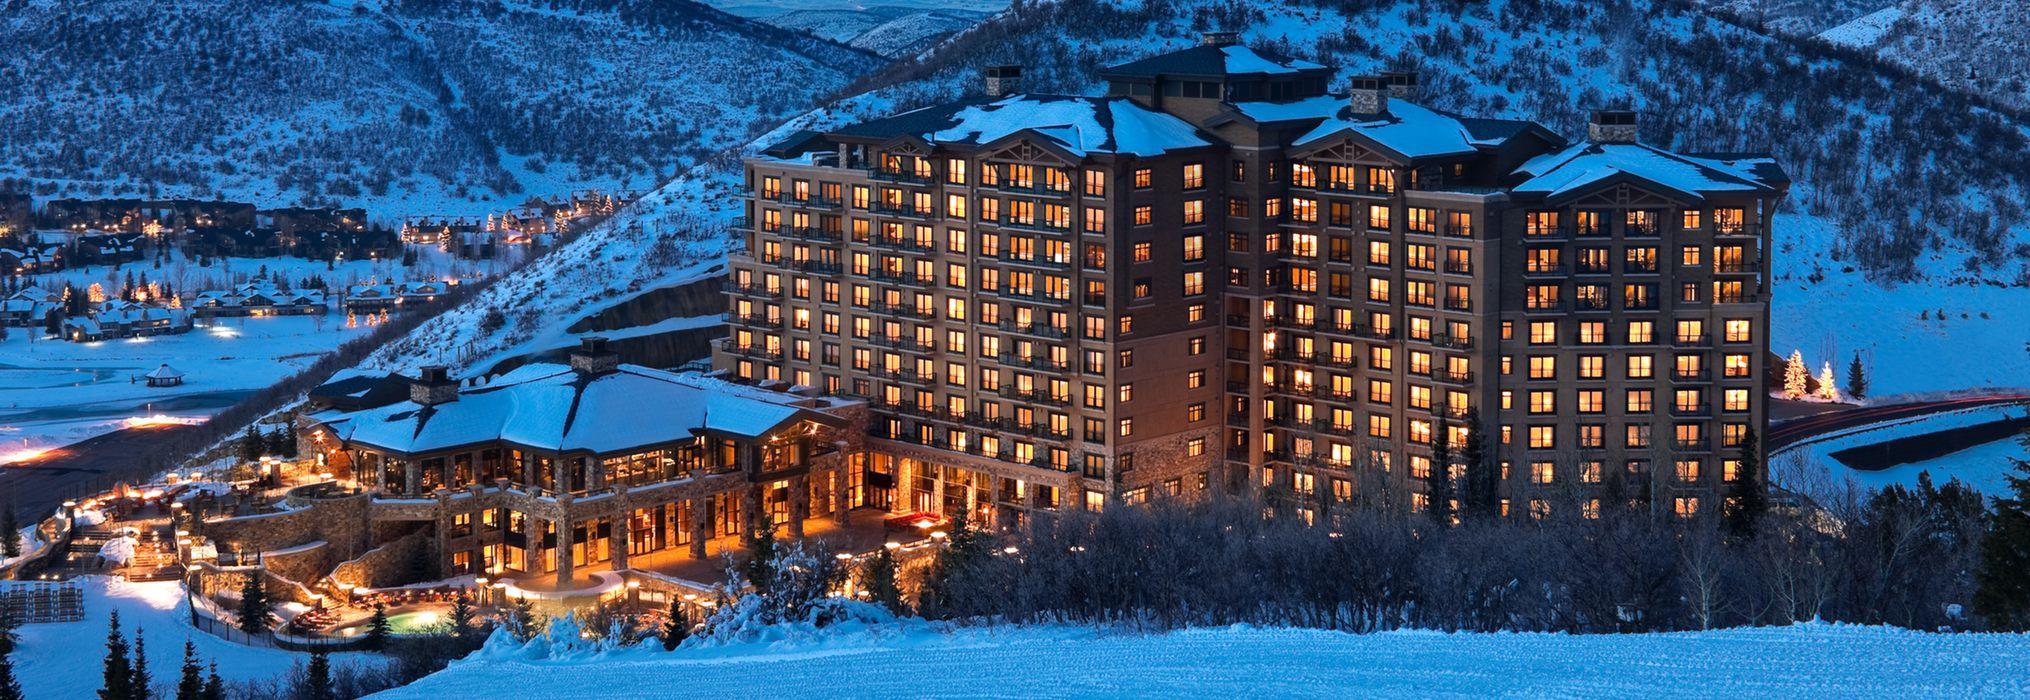 The St. Regis Deer Valley Resort - Work & Travel Year USA